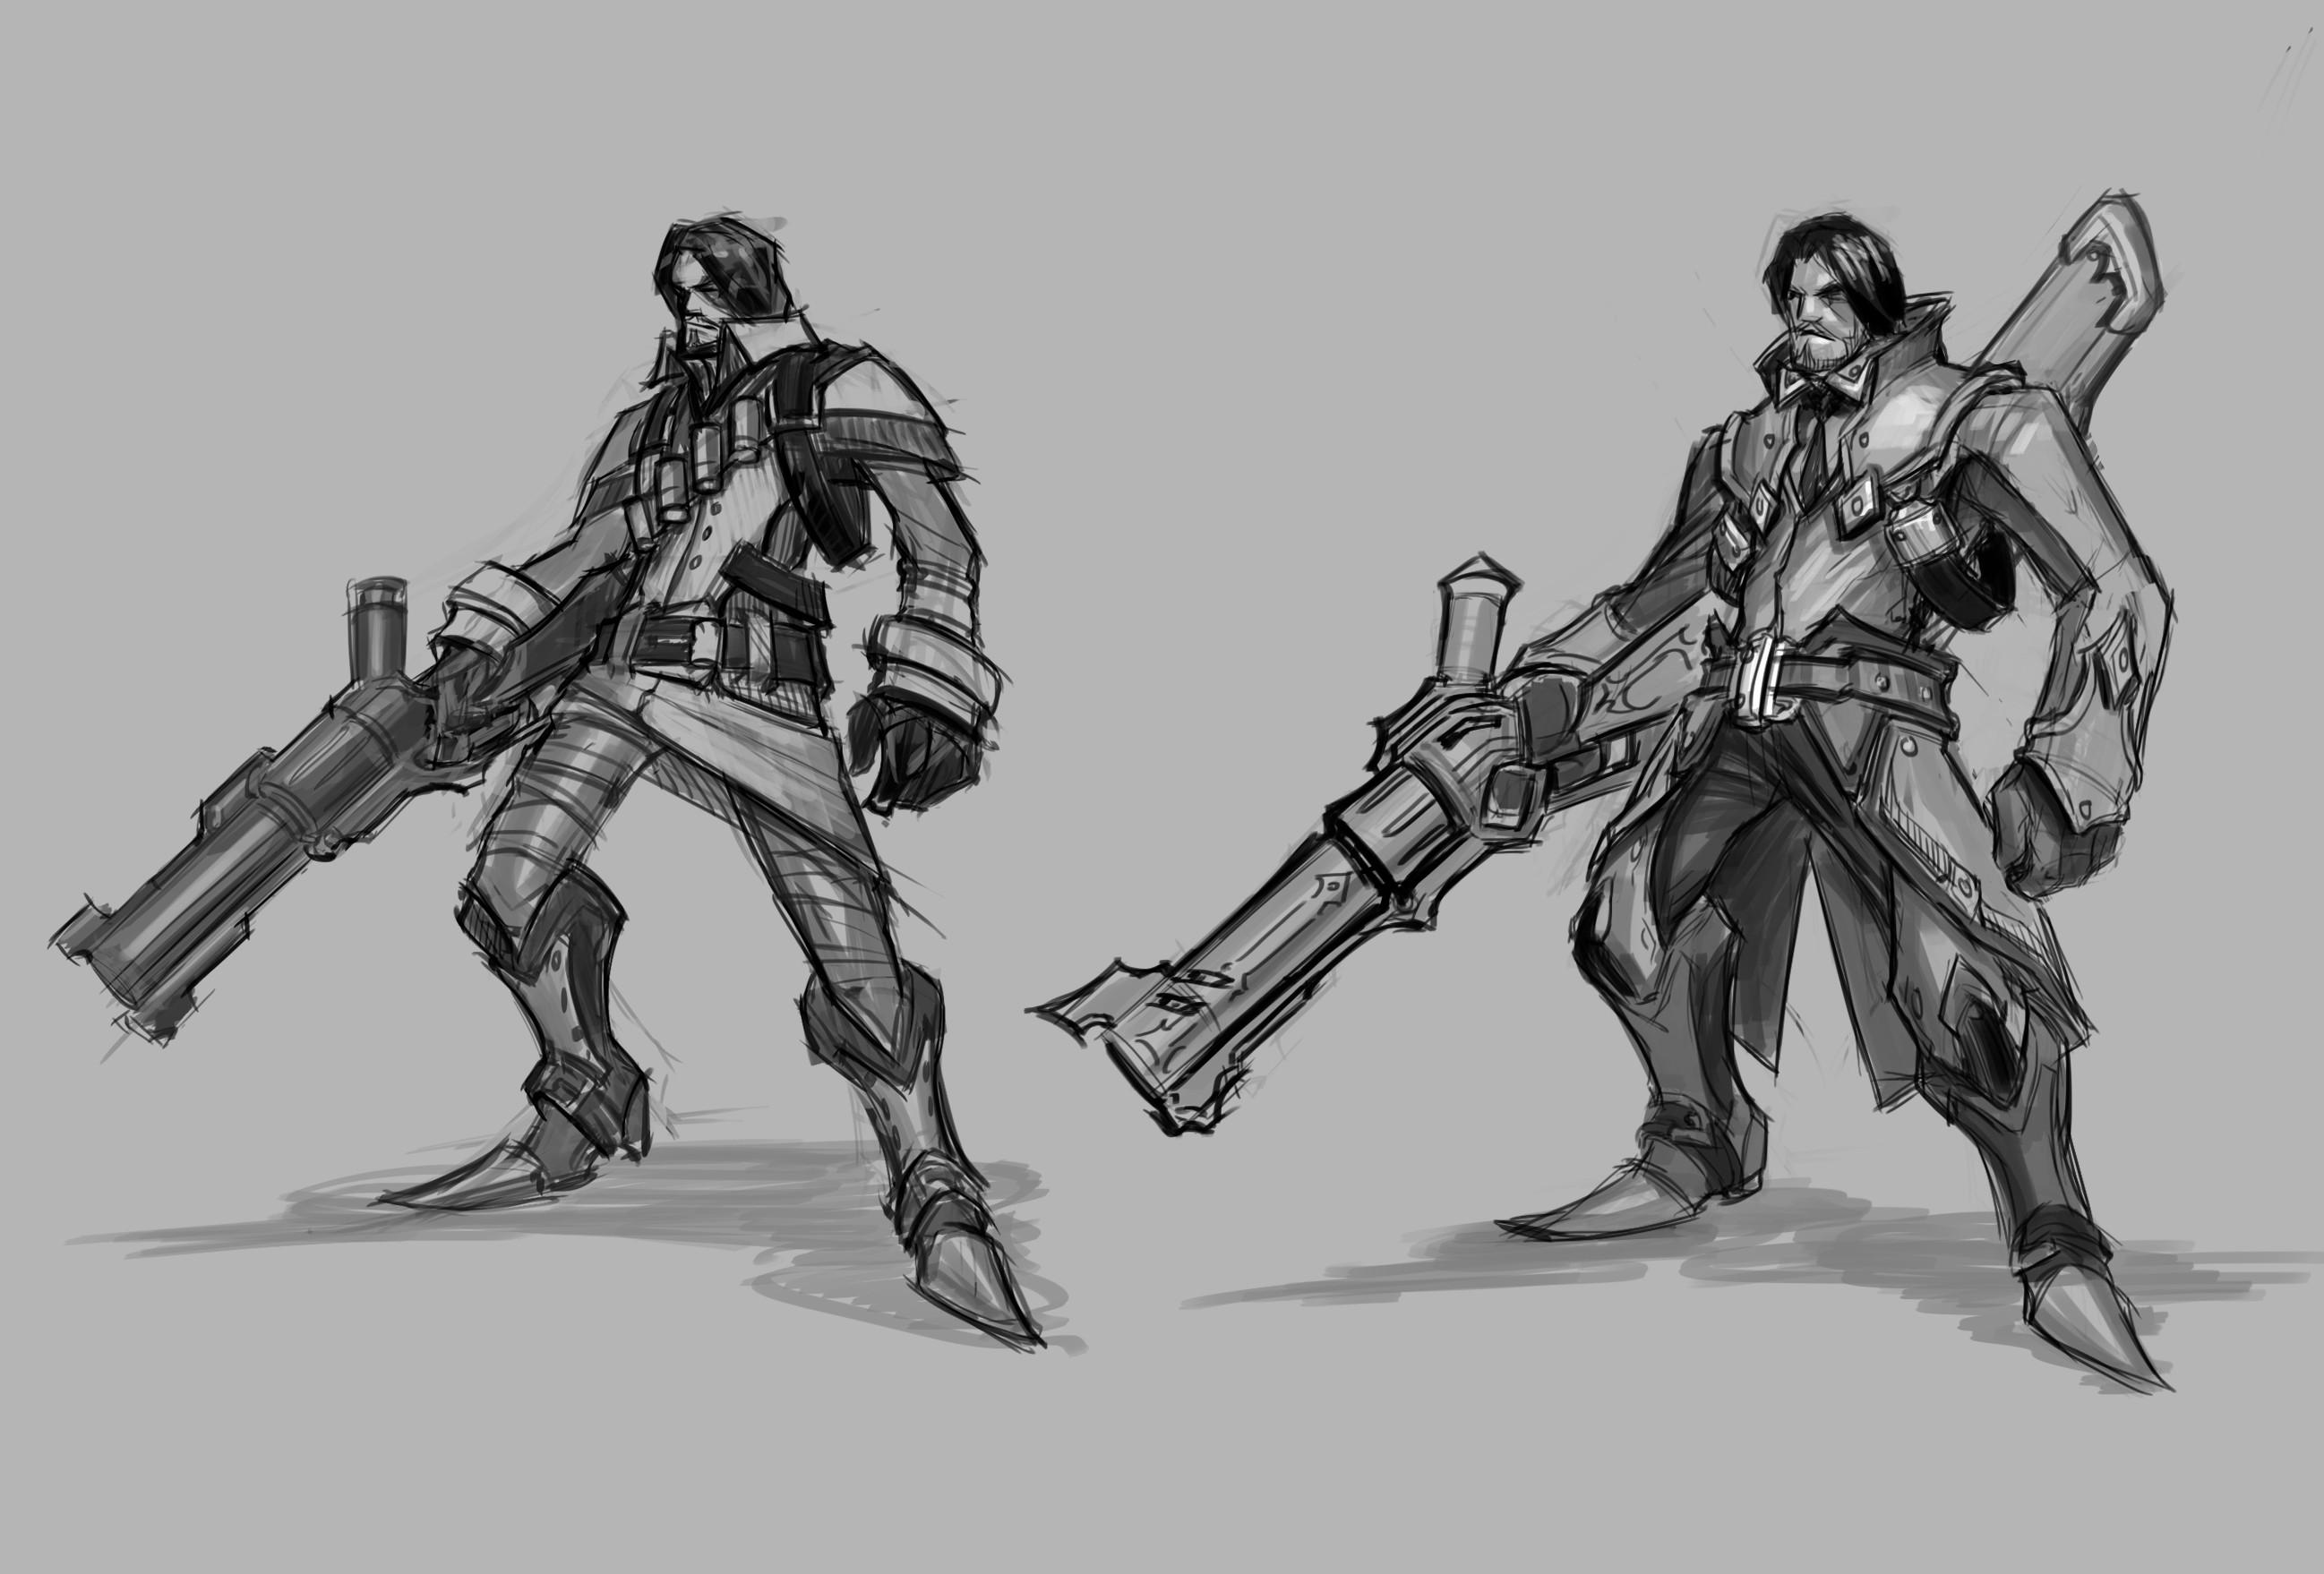 League Of Legends Artist Ironstylus Unveils Original Character Concepts The Escapist For complete results, click here. league of legends artist ironstylus